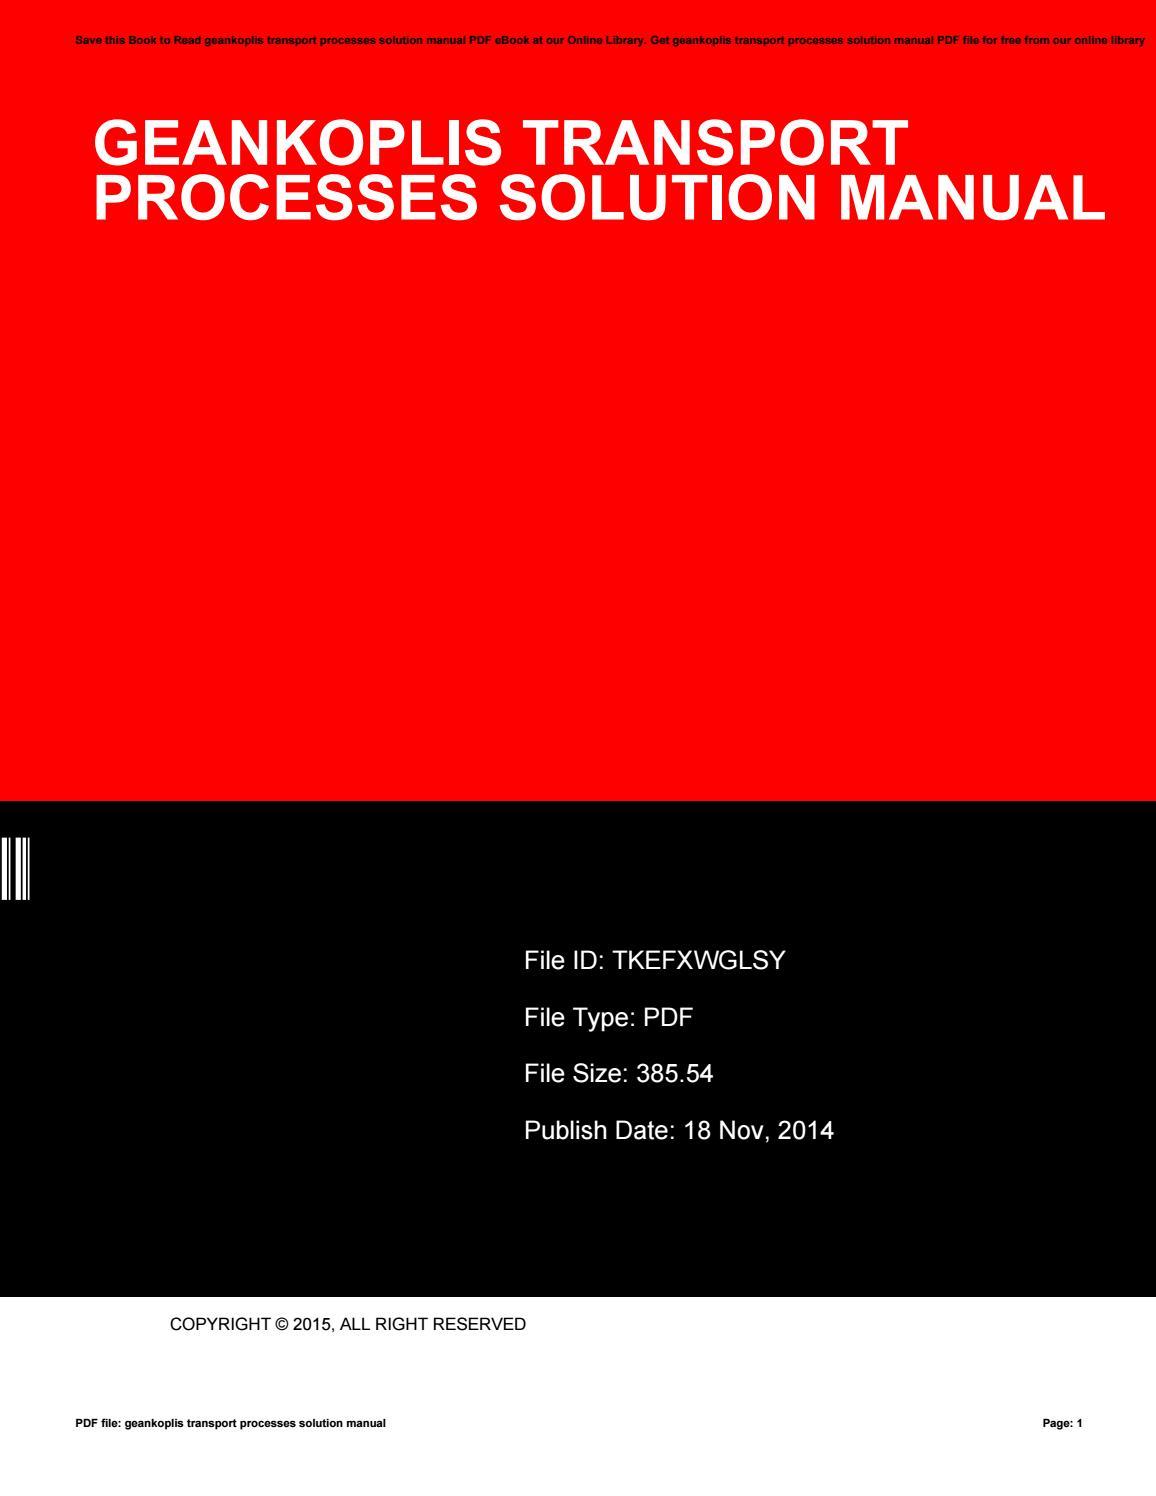 geankoplis transport processes solution manual by myrticeemerson2300 rh issuu com Chemical Engineering Transport Phenomena Transport Phenomena Examples